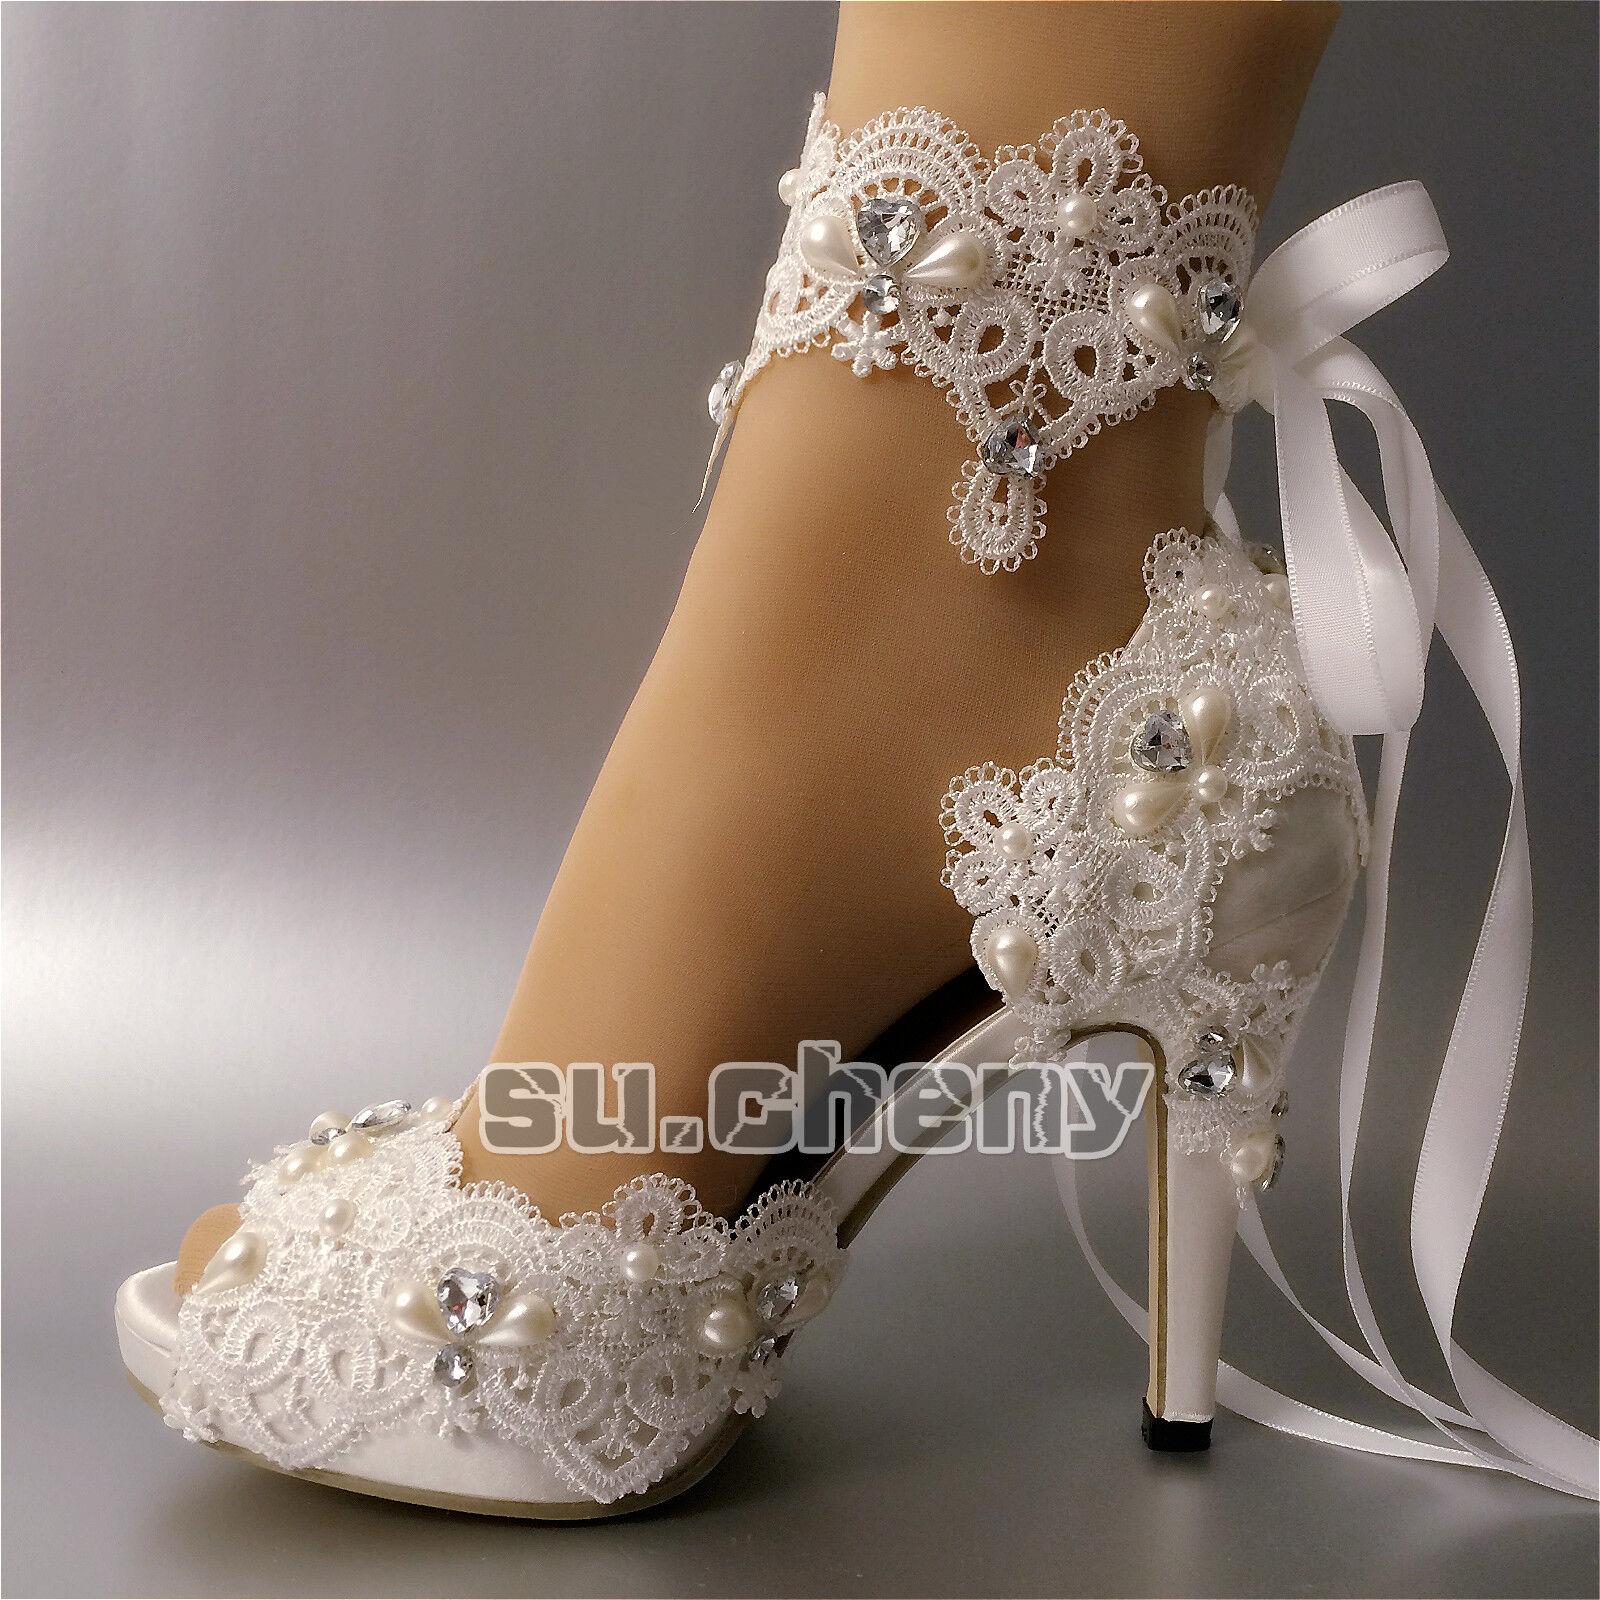 Su.cheny Weiß ivory satin rhinestone rhinestone rhinestone open toe ribbon ankle Wedding Bridal schuhe 893d0f